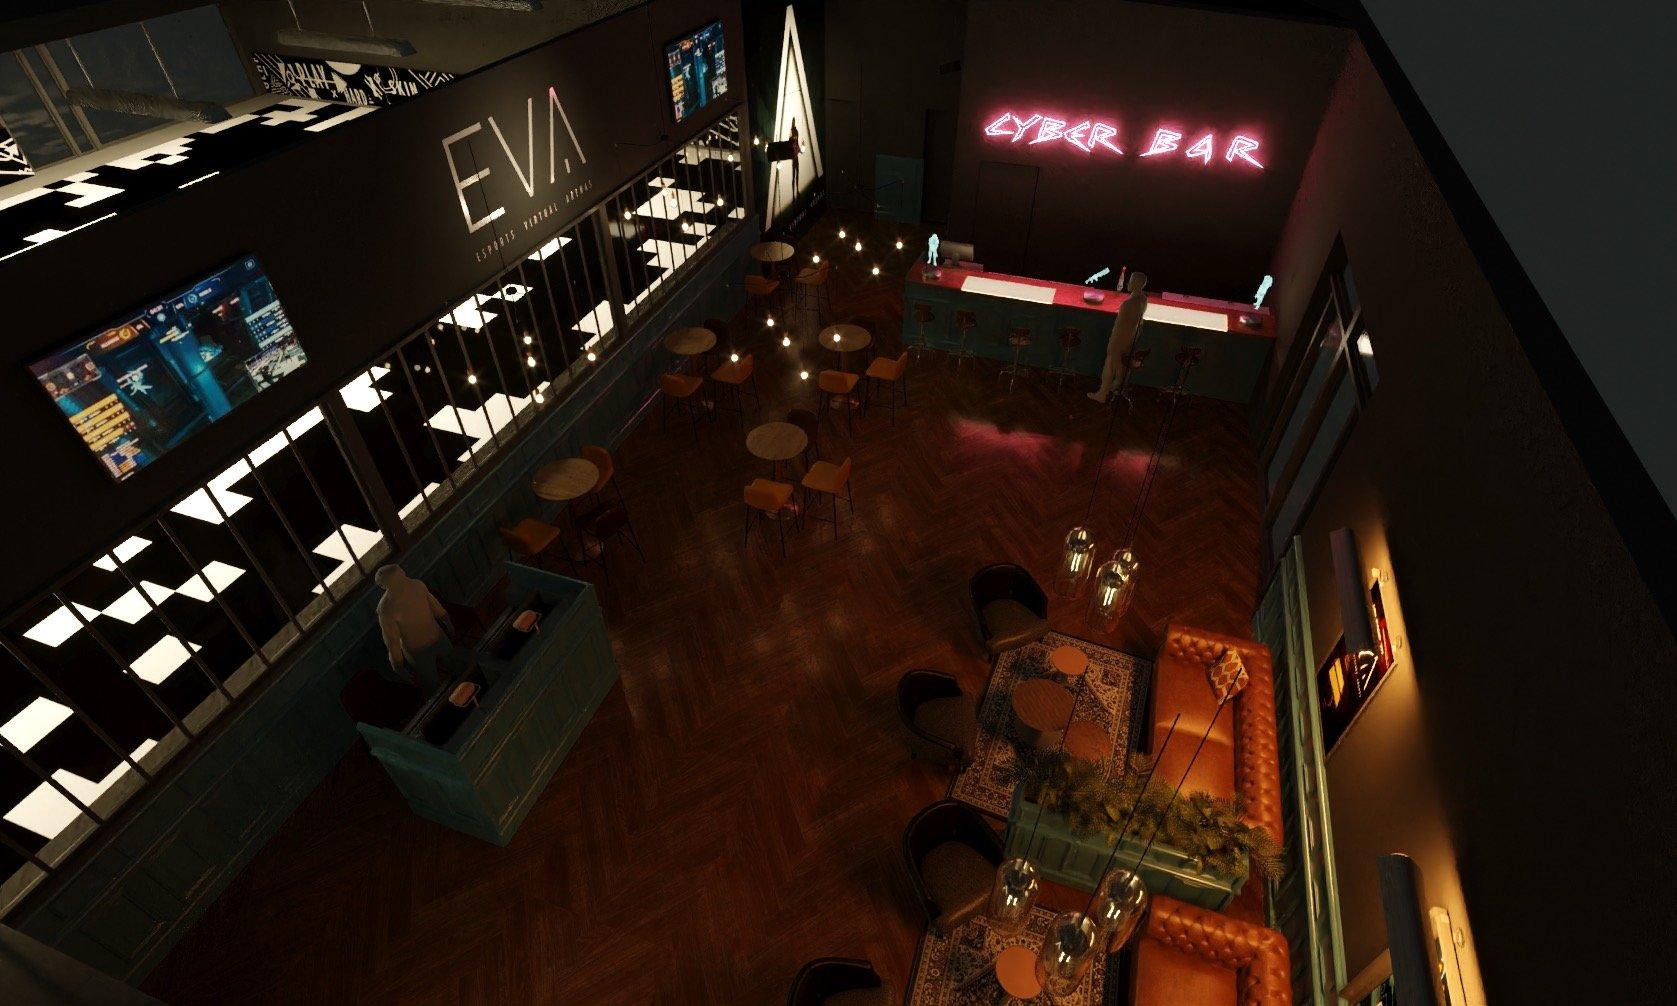 EVA 3D Layout